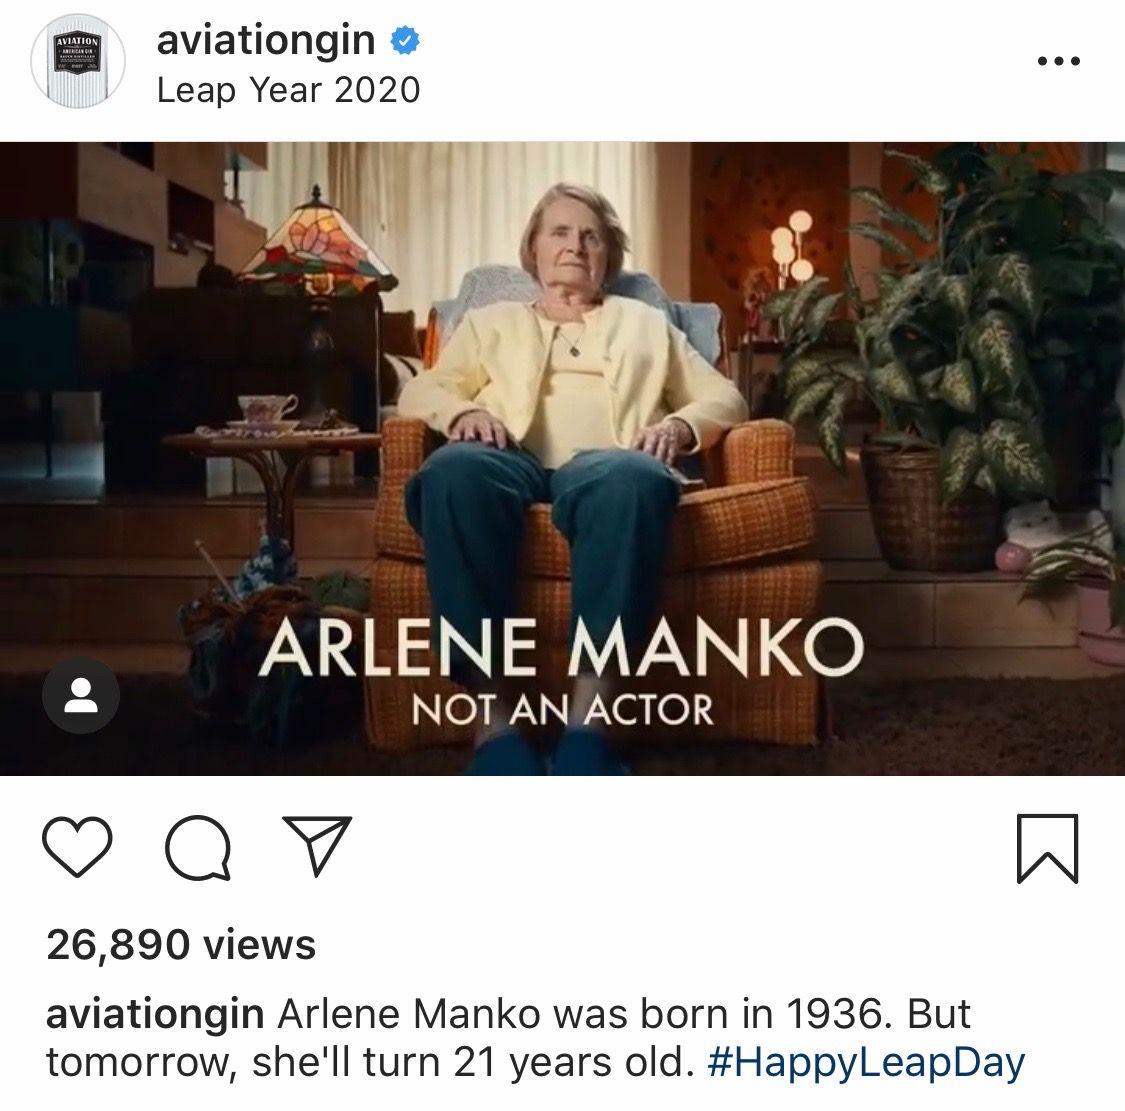 Still image taken from an @aviationgin Instagram post